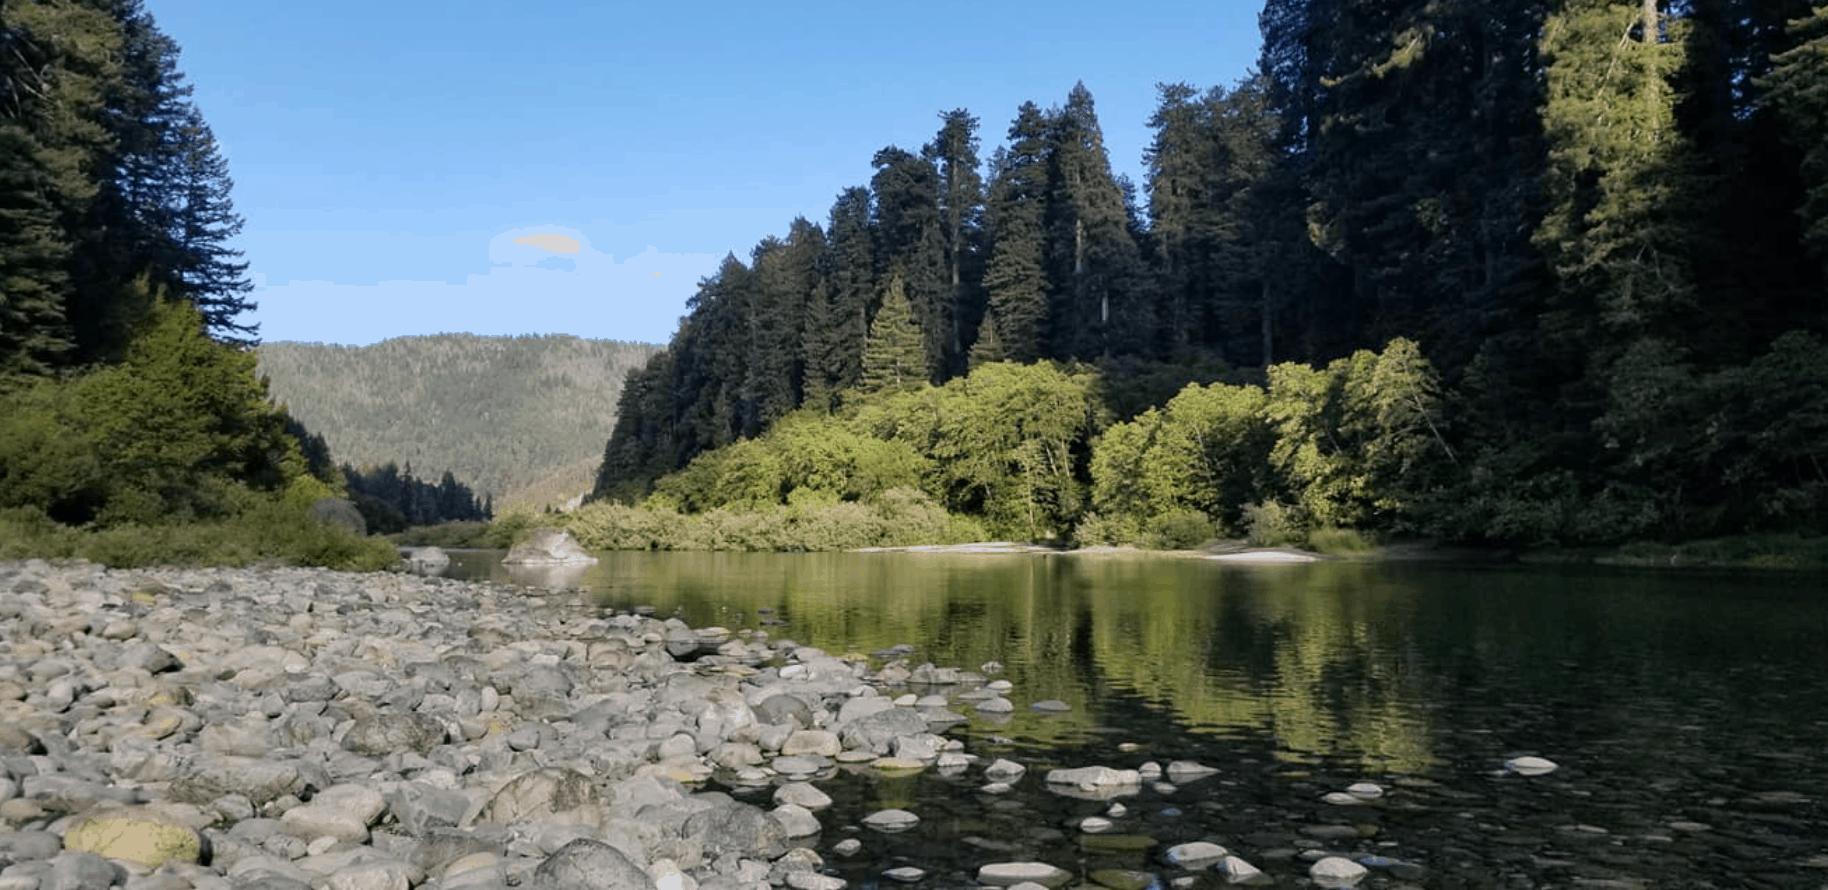 lake at Jedidiah Smith Redwoods state park